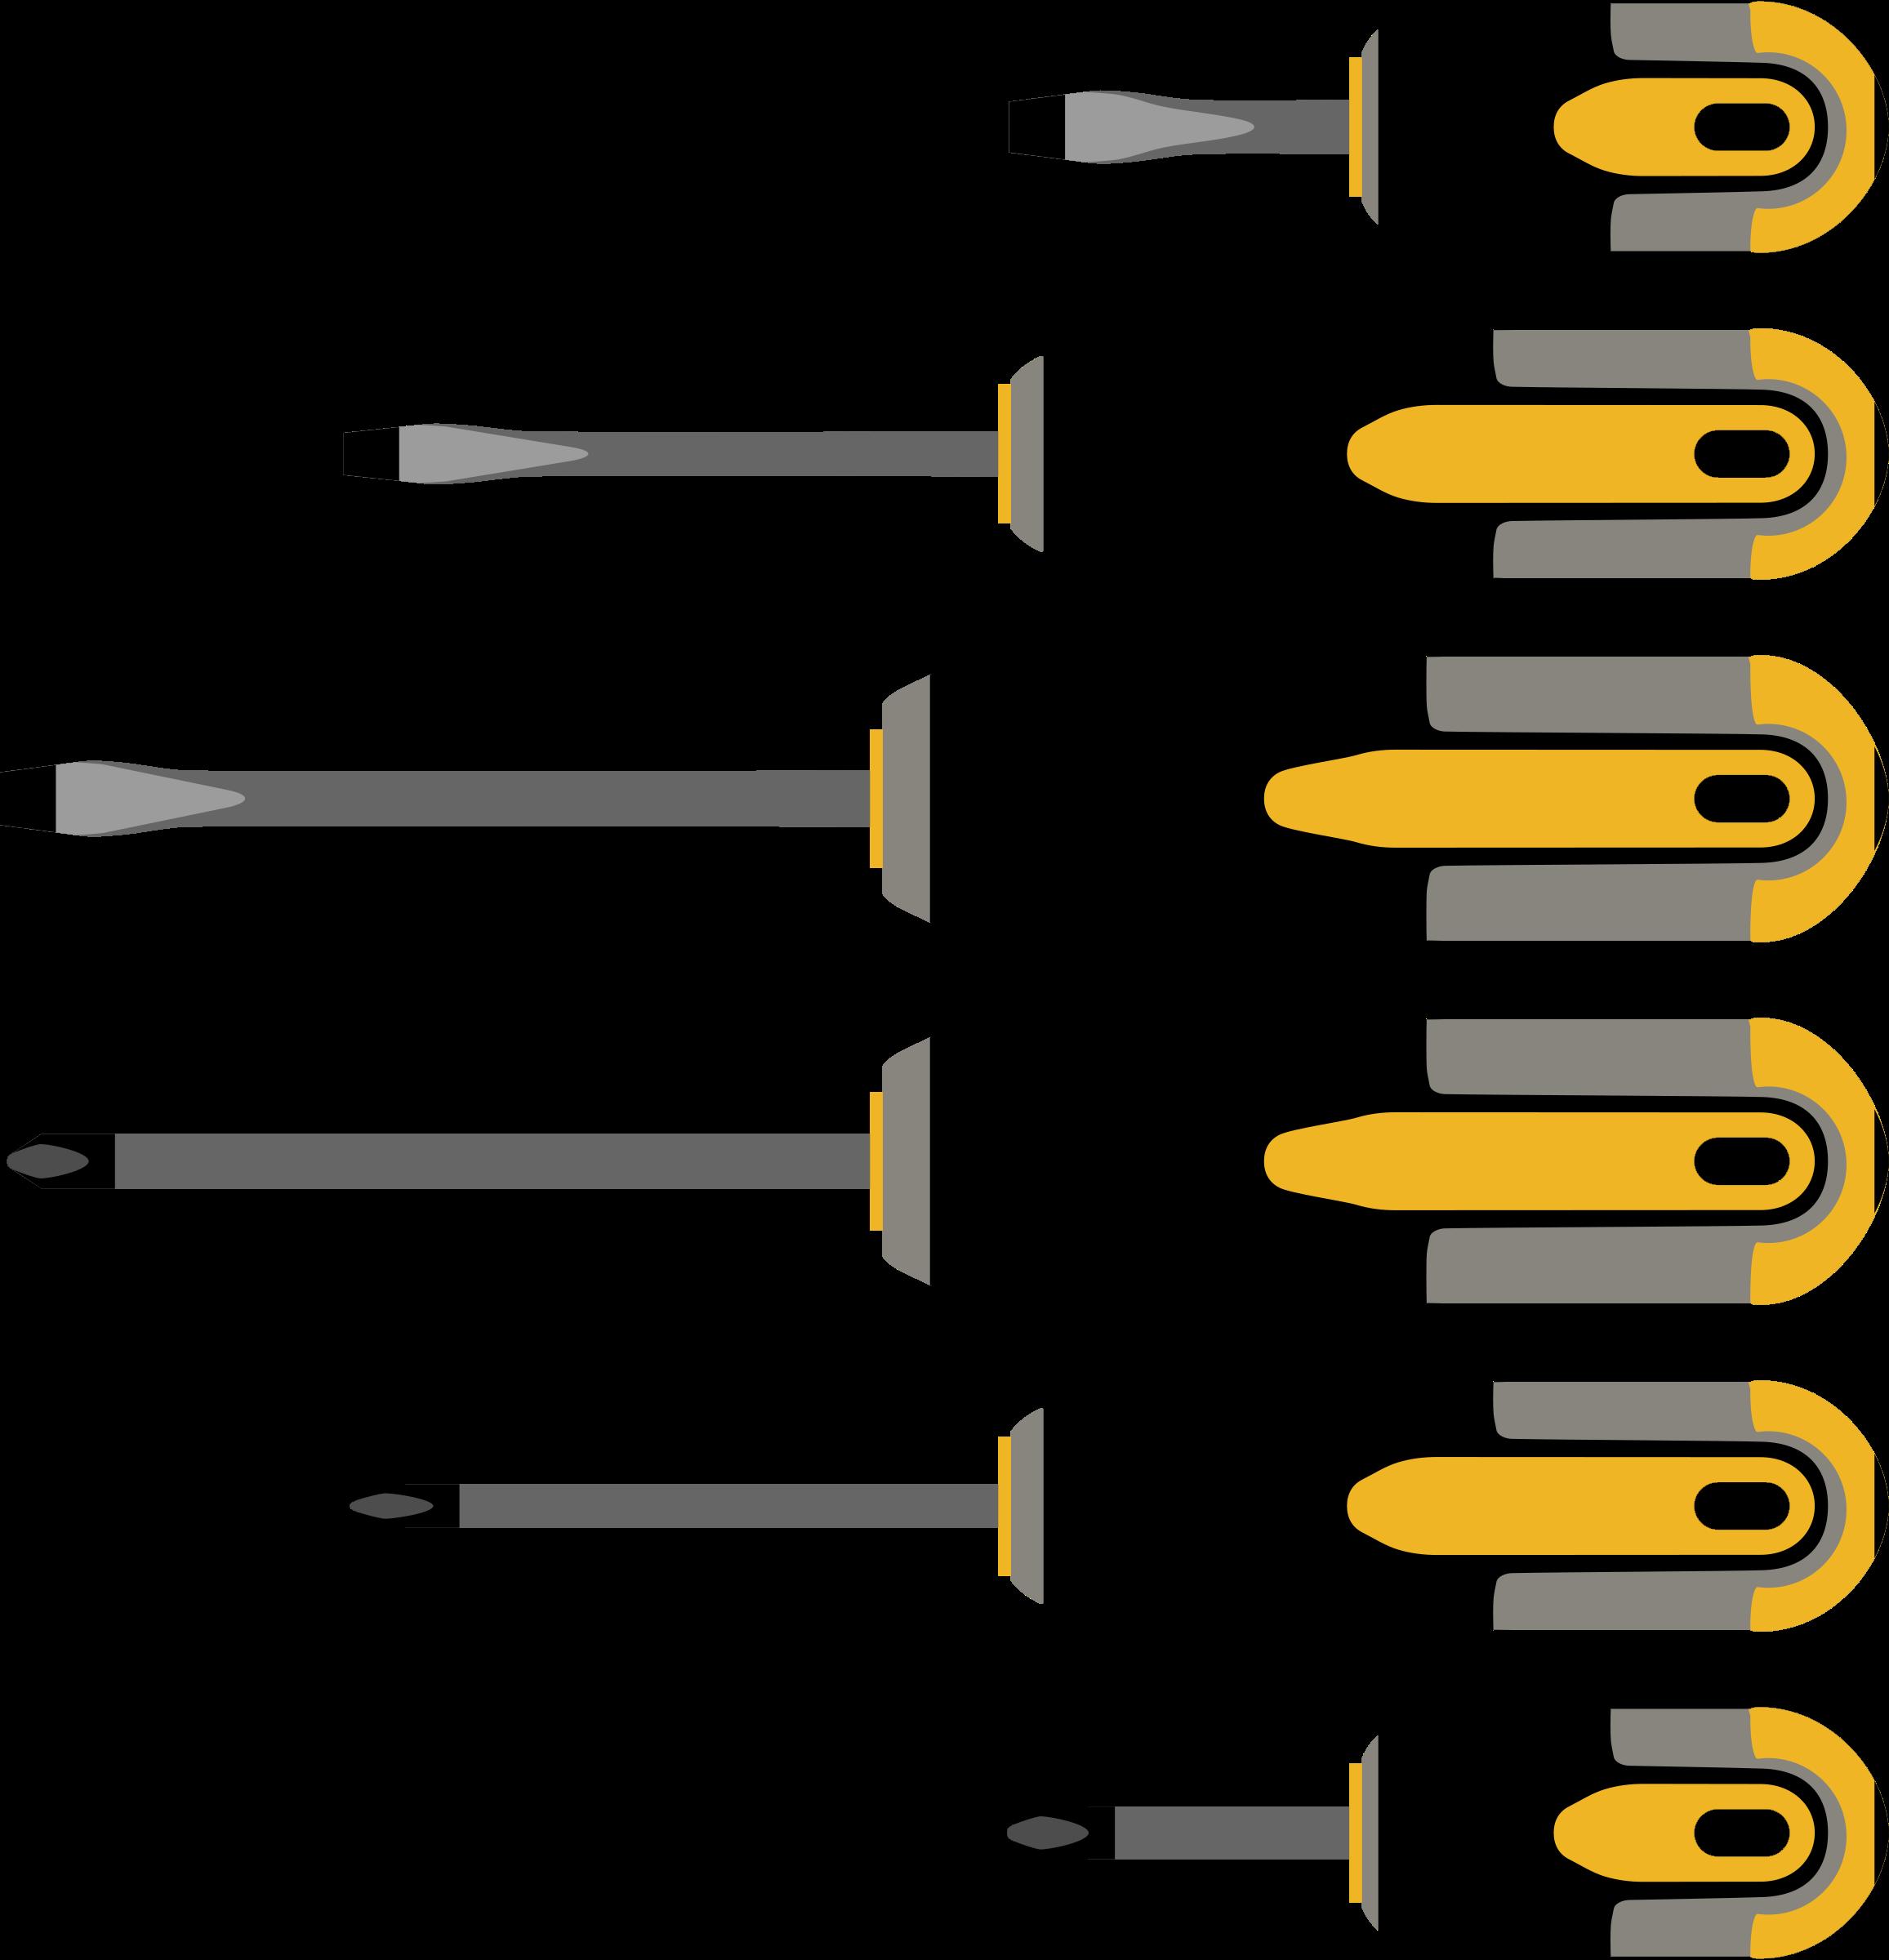 screwdriver clipart different